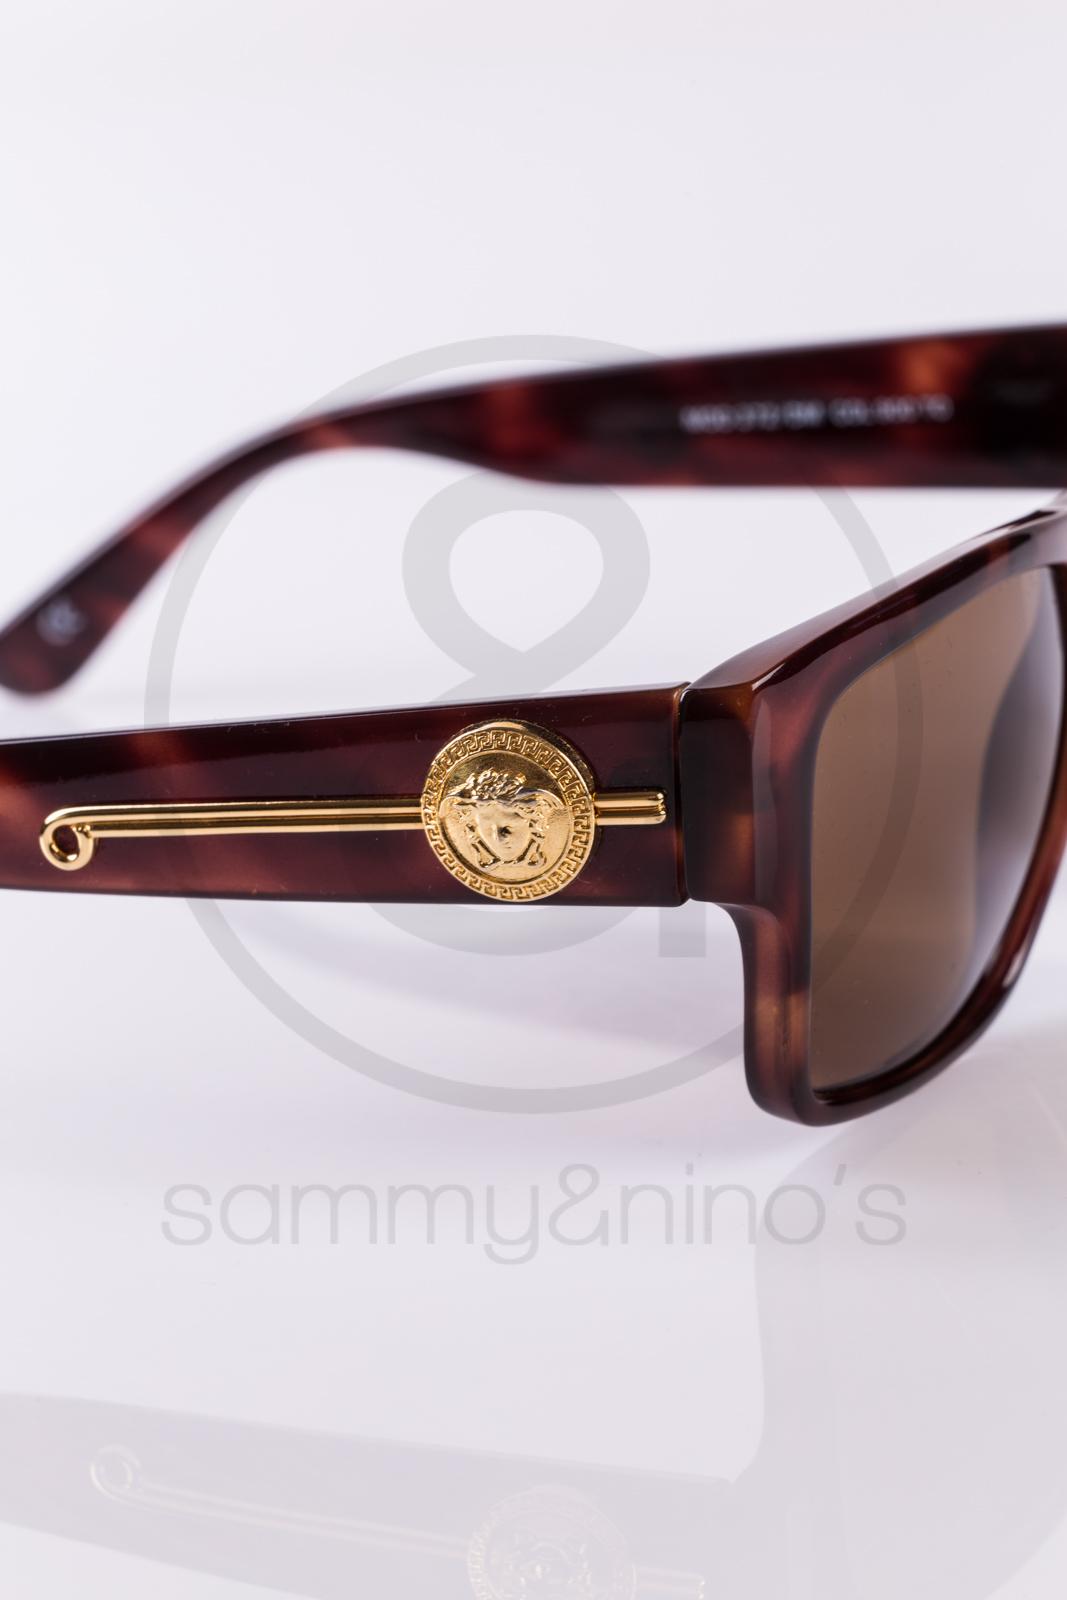 784f1cb2b9 Previous  Next. HomeSOLD OUTGianni Versace 372 dm 900